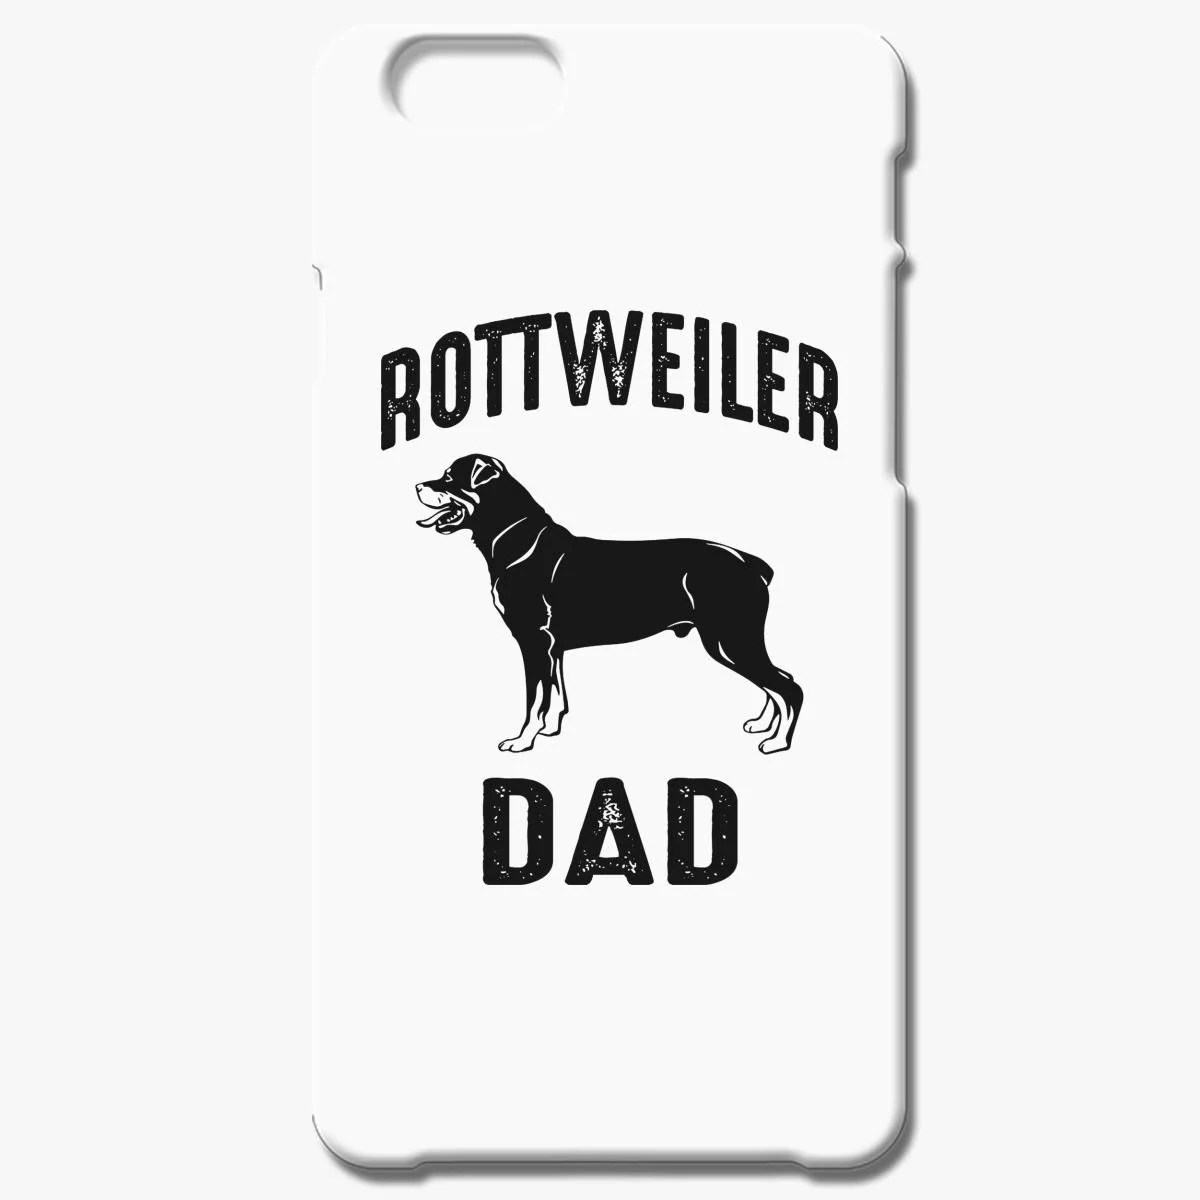 Rottweiler Dad Iphone 6 6s Case